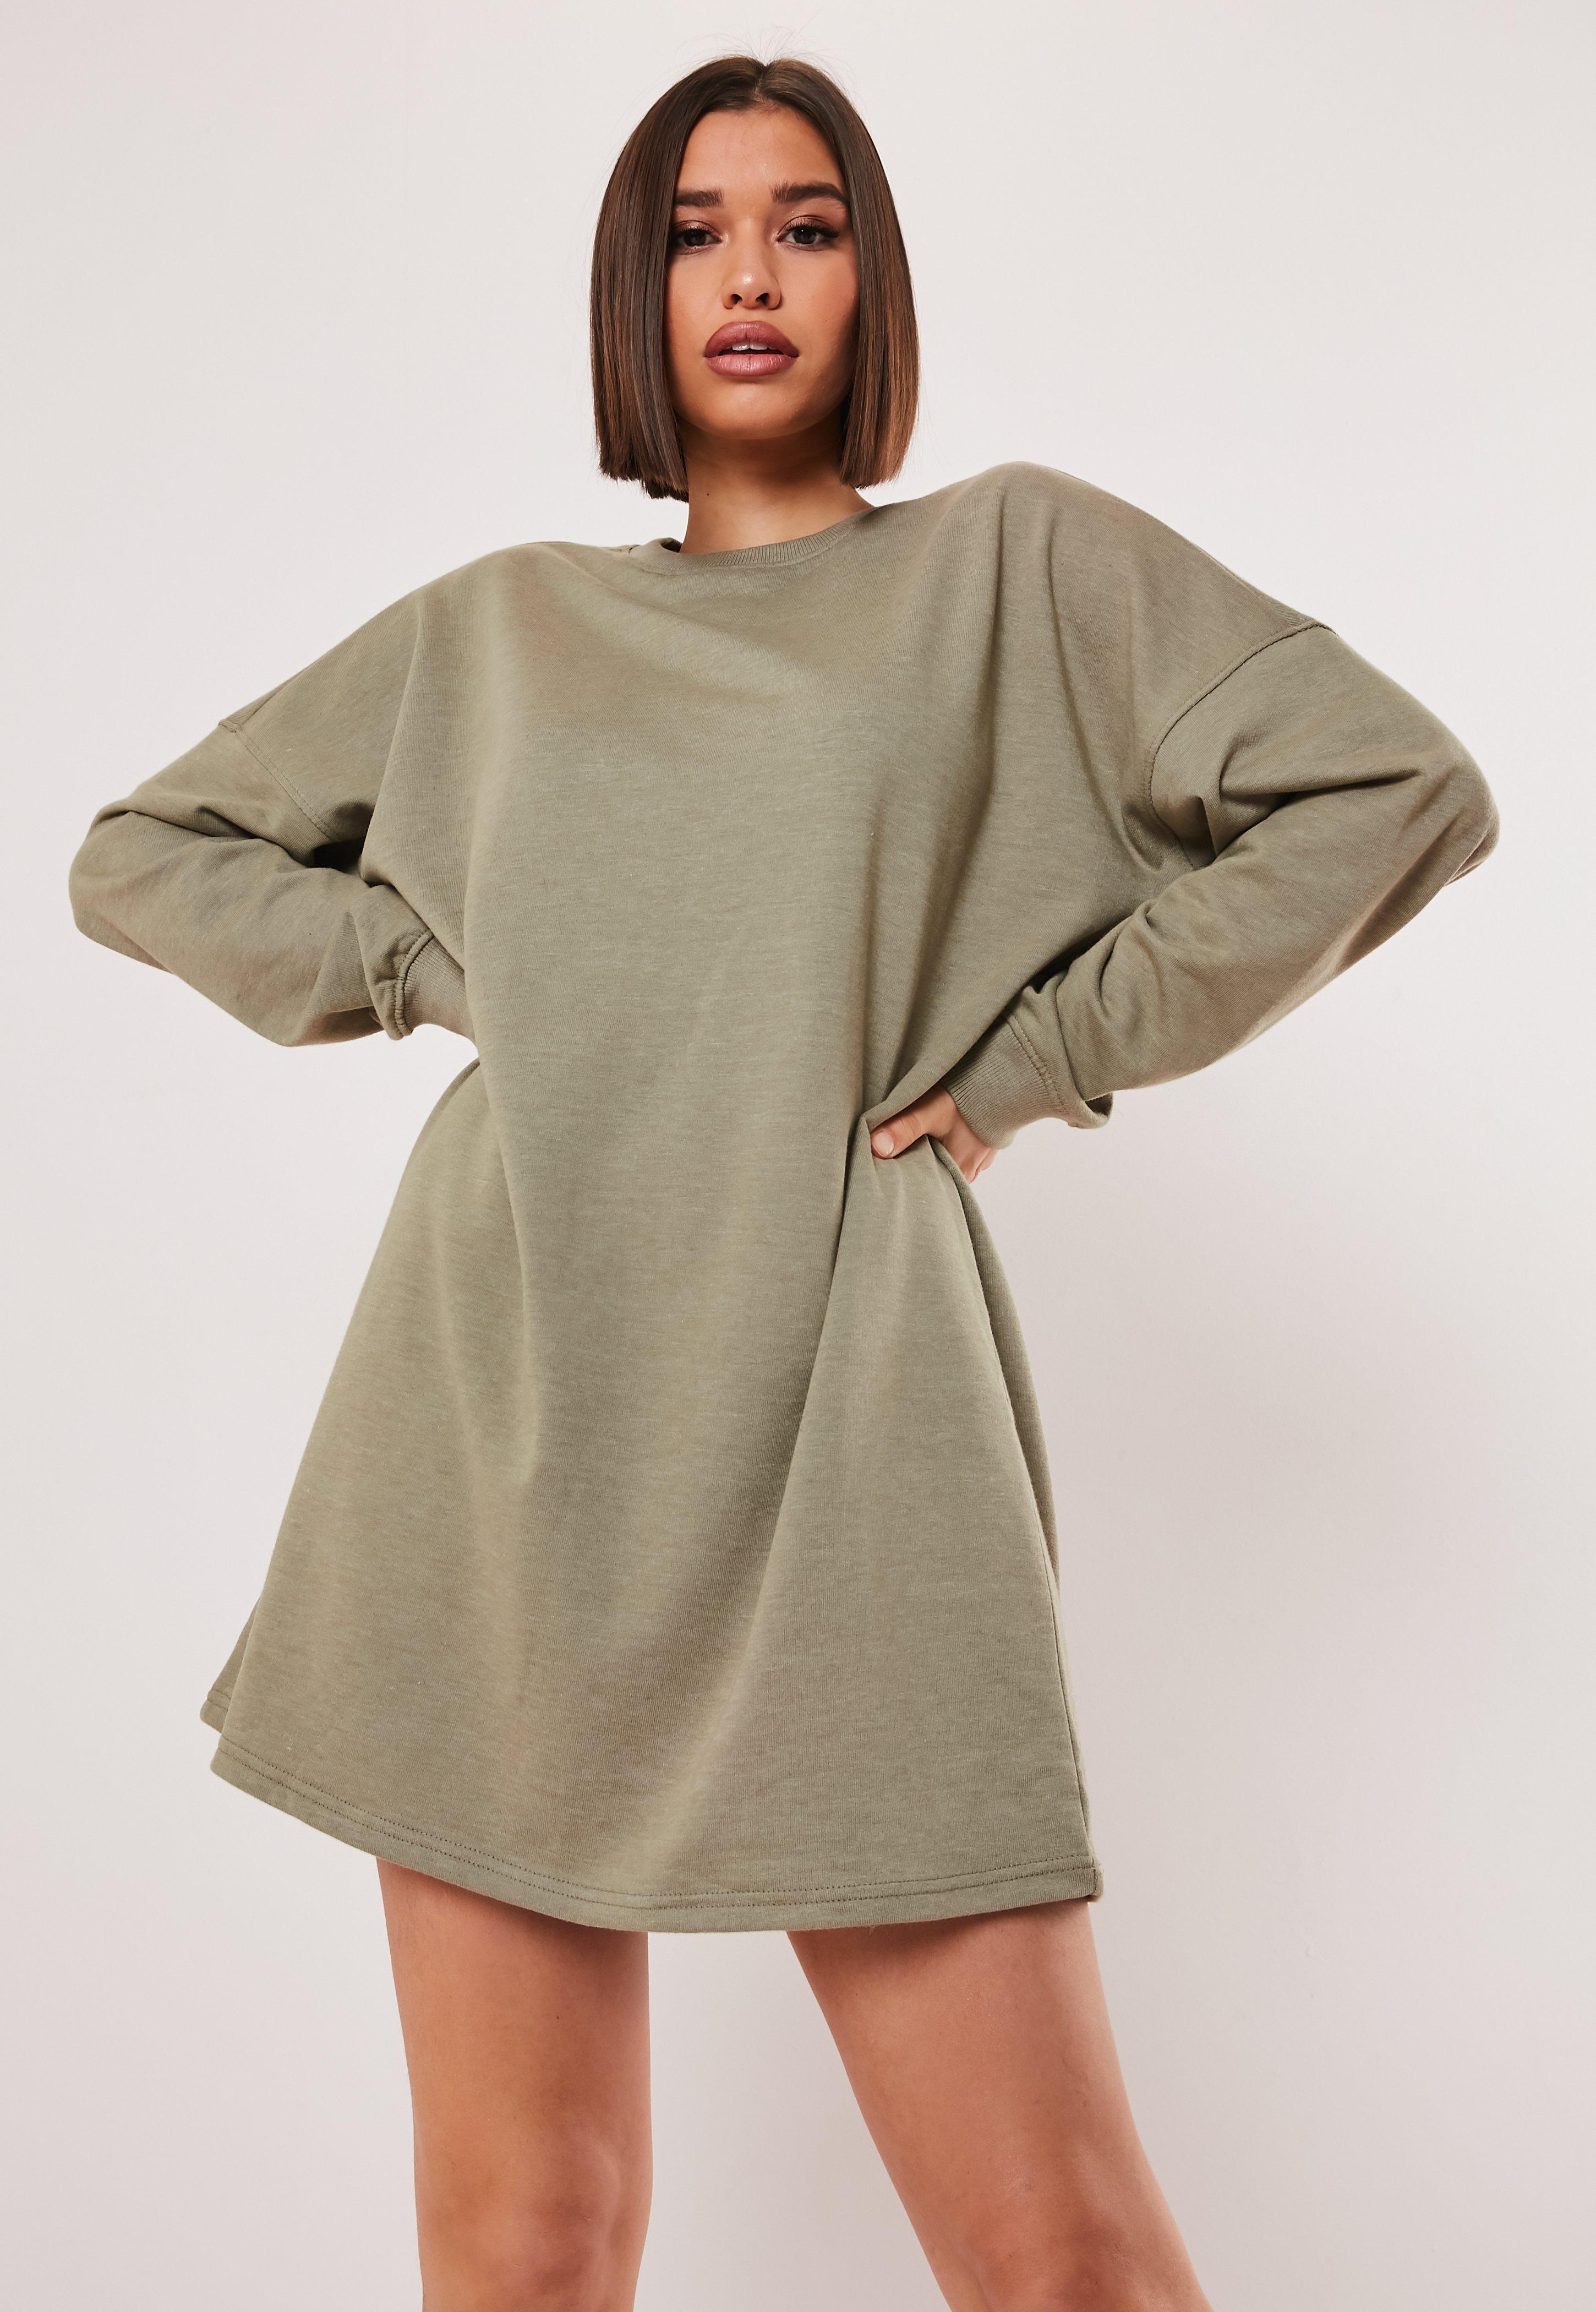 bbec32a8c5fb5 Khaki Oversized Sweater Dress